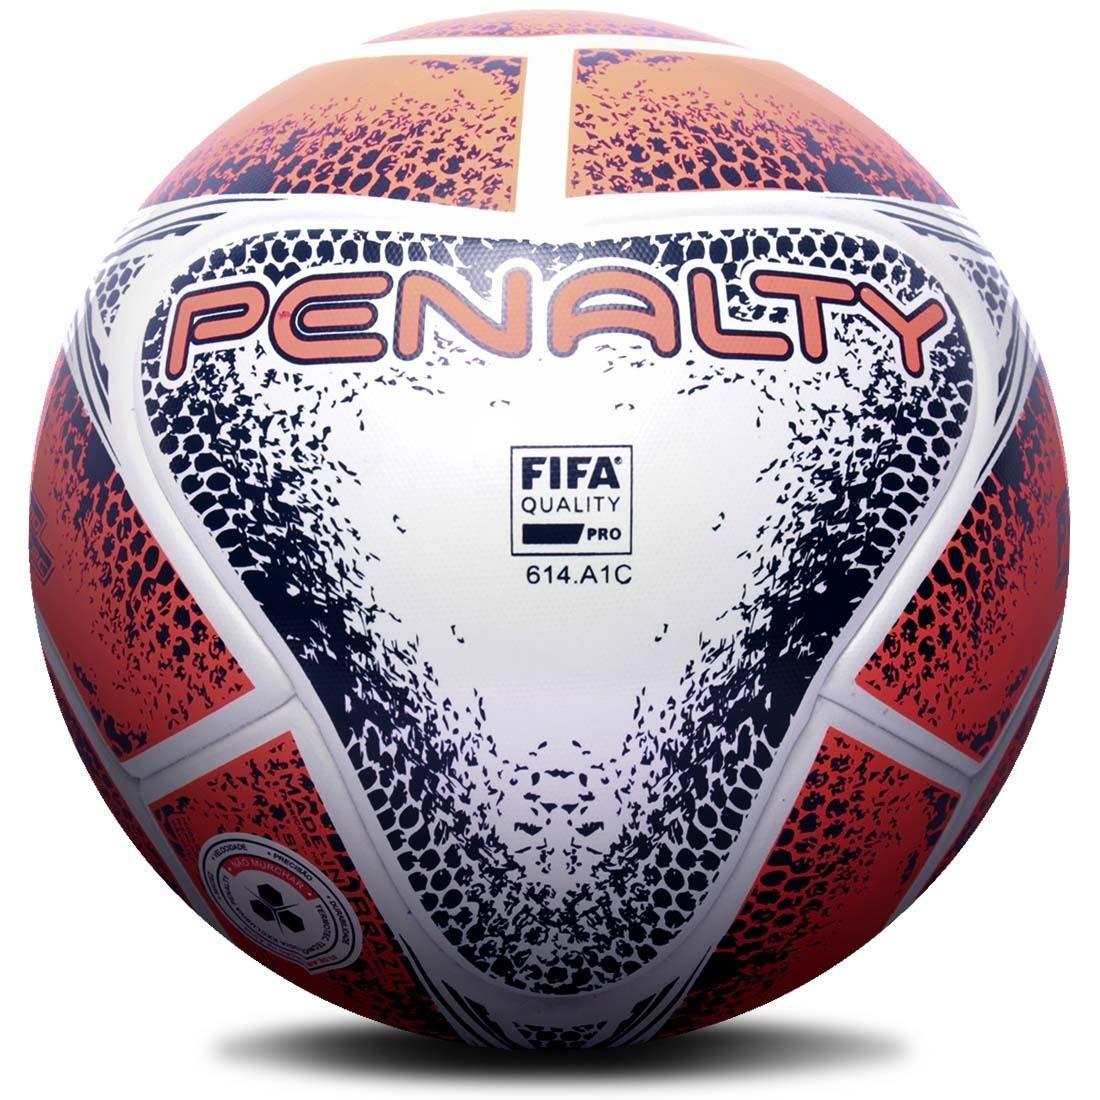 97a170299b Carregando zoom... futsal penalty bola. Carregando zoom... bola futsal  penalty max 1000 aprovada fifa 2018 original